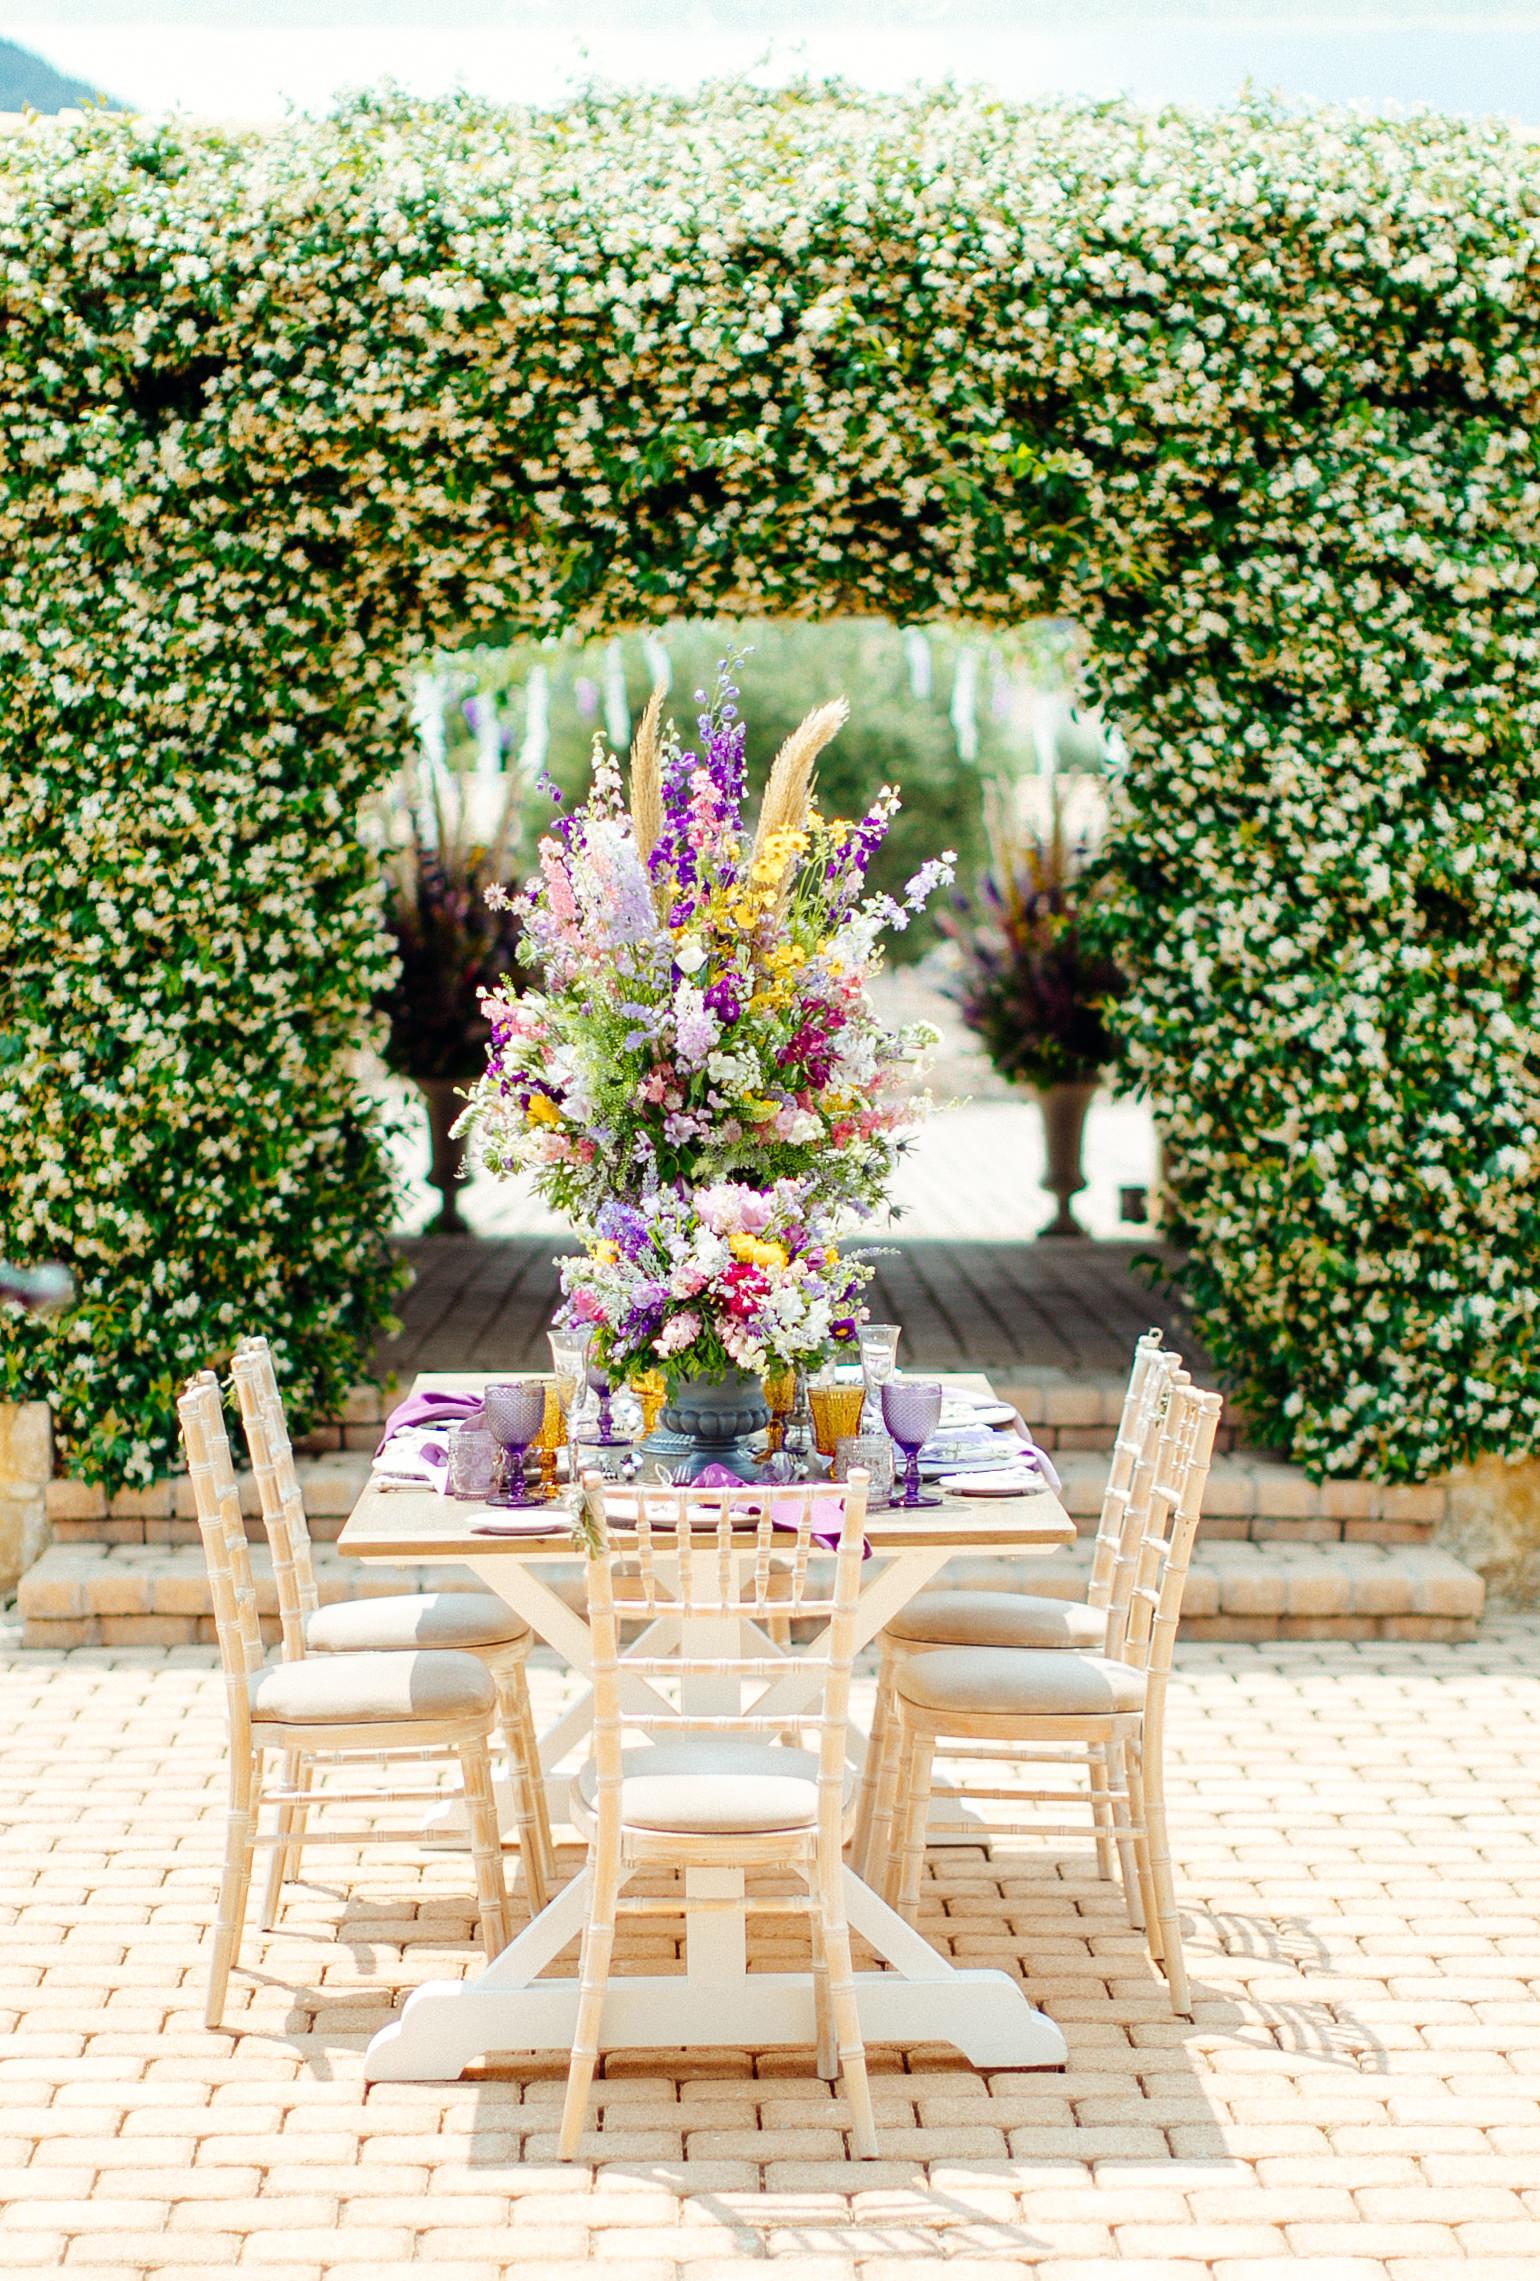 summer wedding flowers sotiris tsakanikas table and chairs